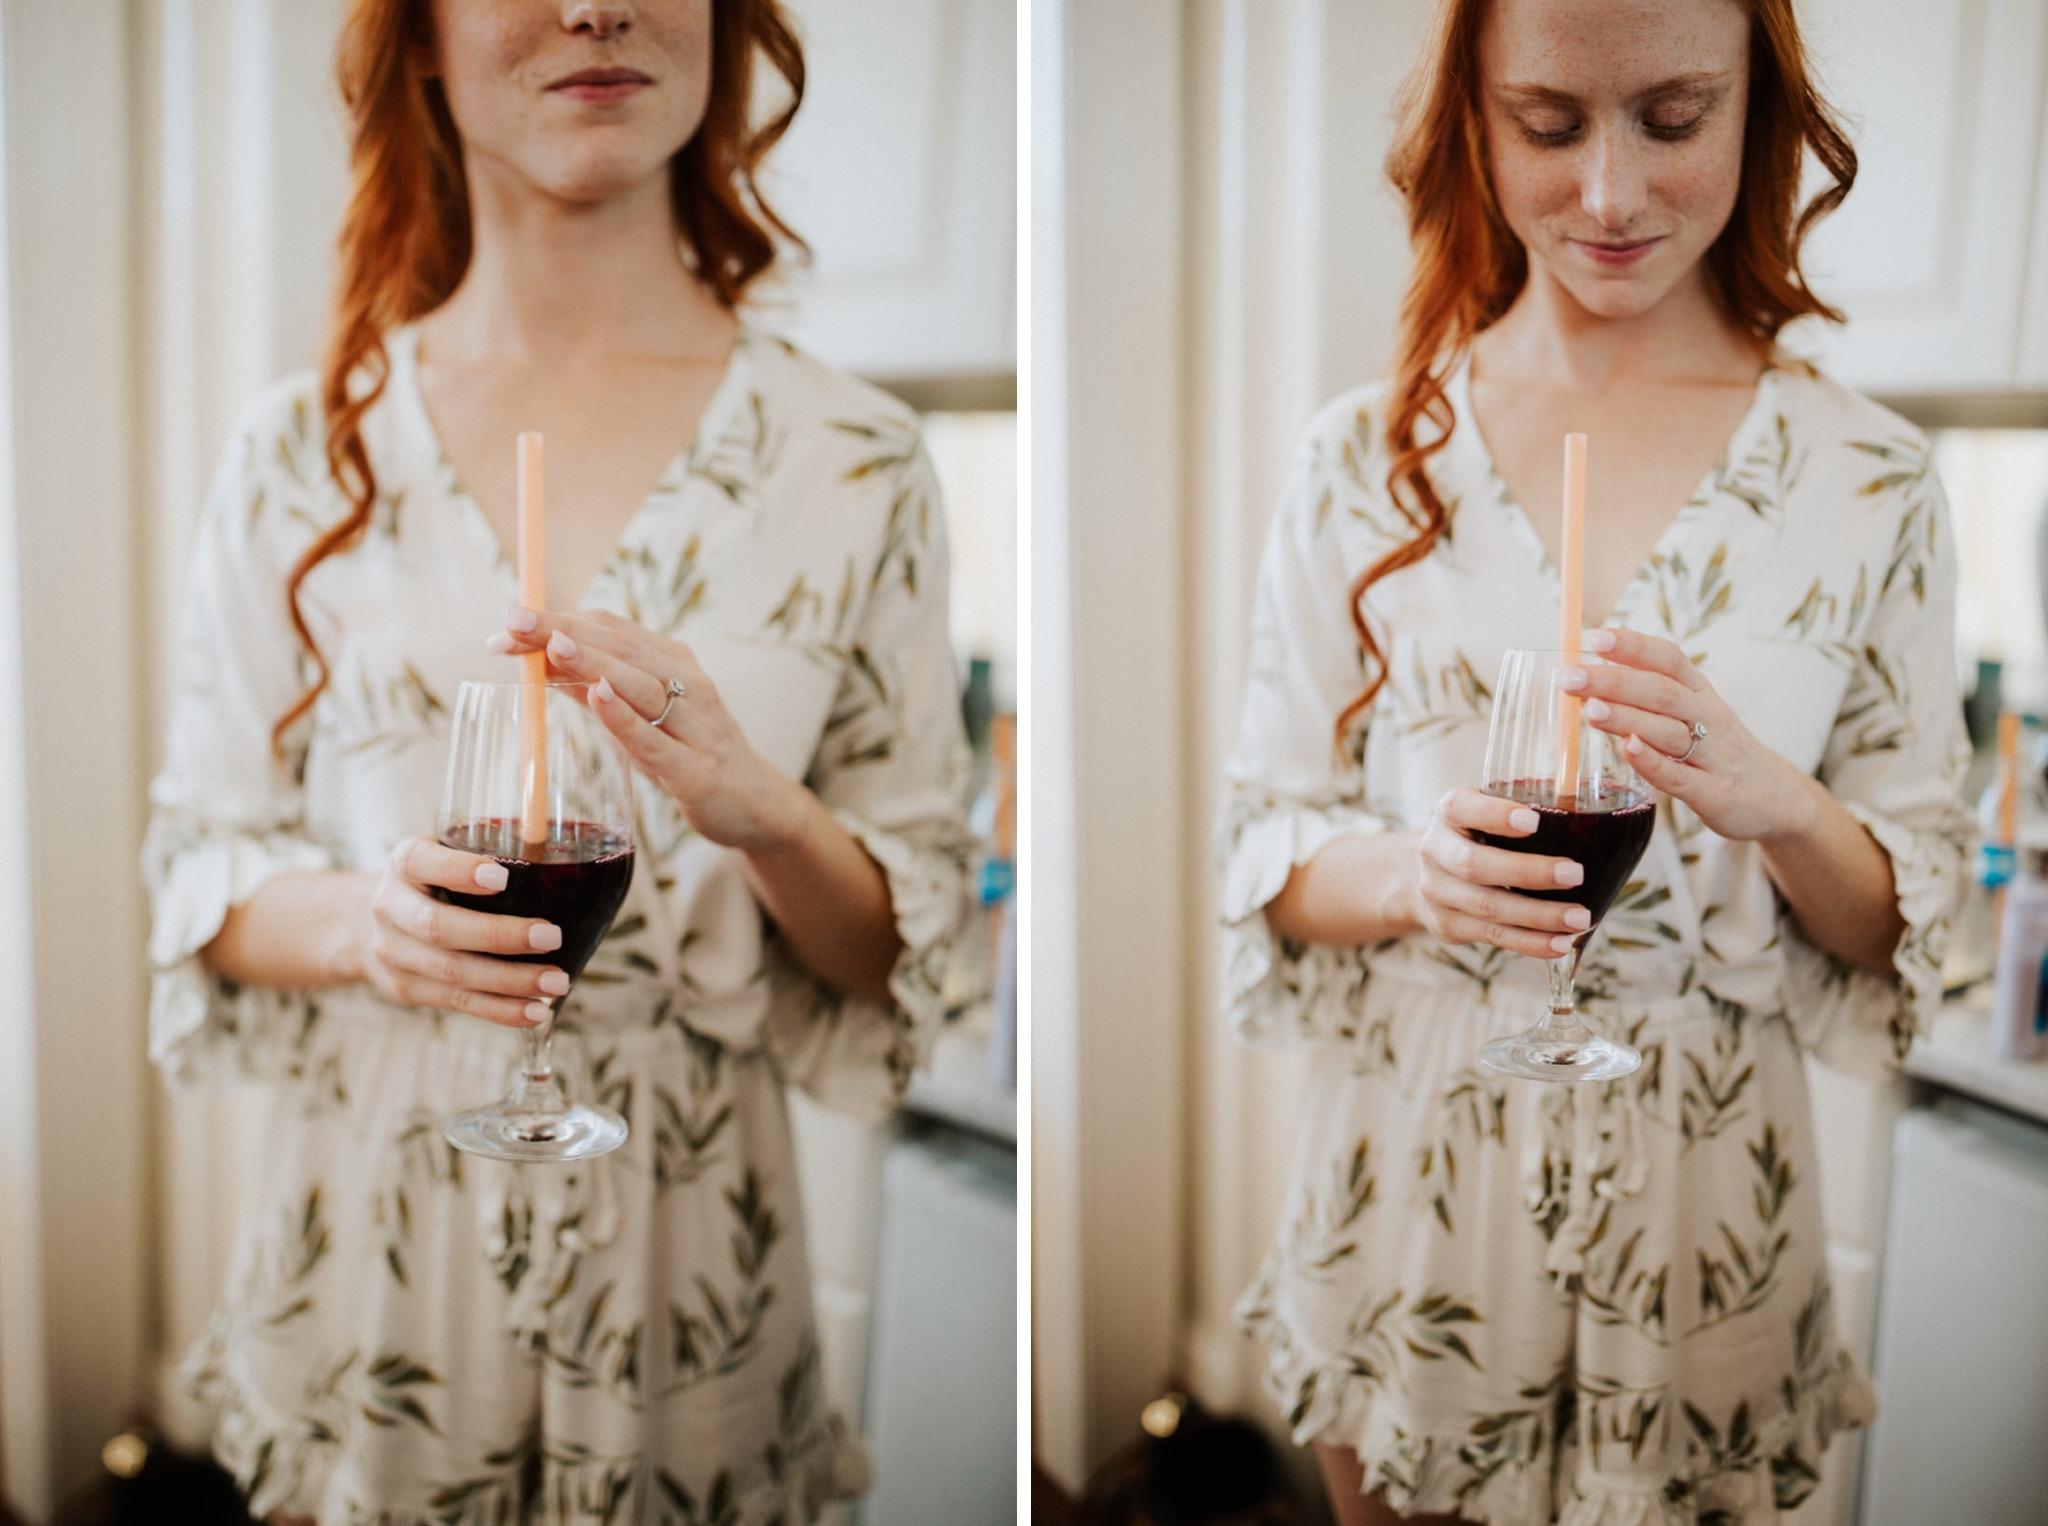 09_West Manor Estate Weddings - Pat Cori Photography-17_West Manor Estate Weddings - Pat Cori Photography-16_bride_VirginiaWeddingPhotographer_gettingready_WestManorEstate_Portraits_Wedding.jpg